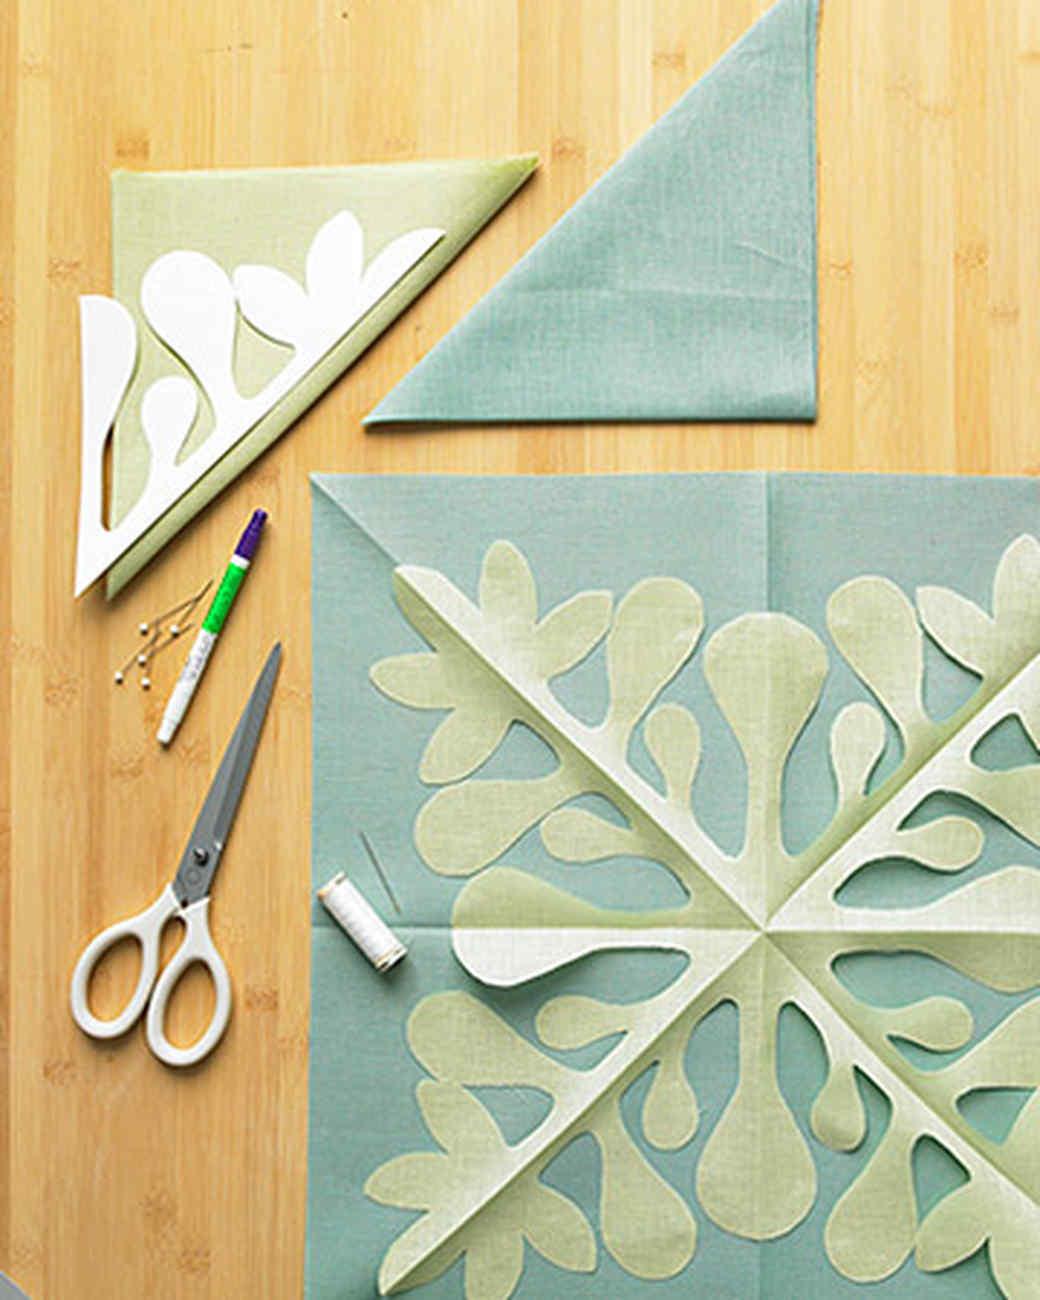 Free Printable Hawaiian Quilt Patterns | Download Them Or Print - Free Printable Hawaiian Quilt Patterns